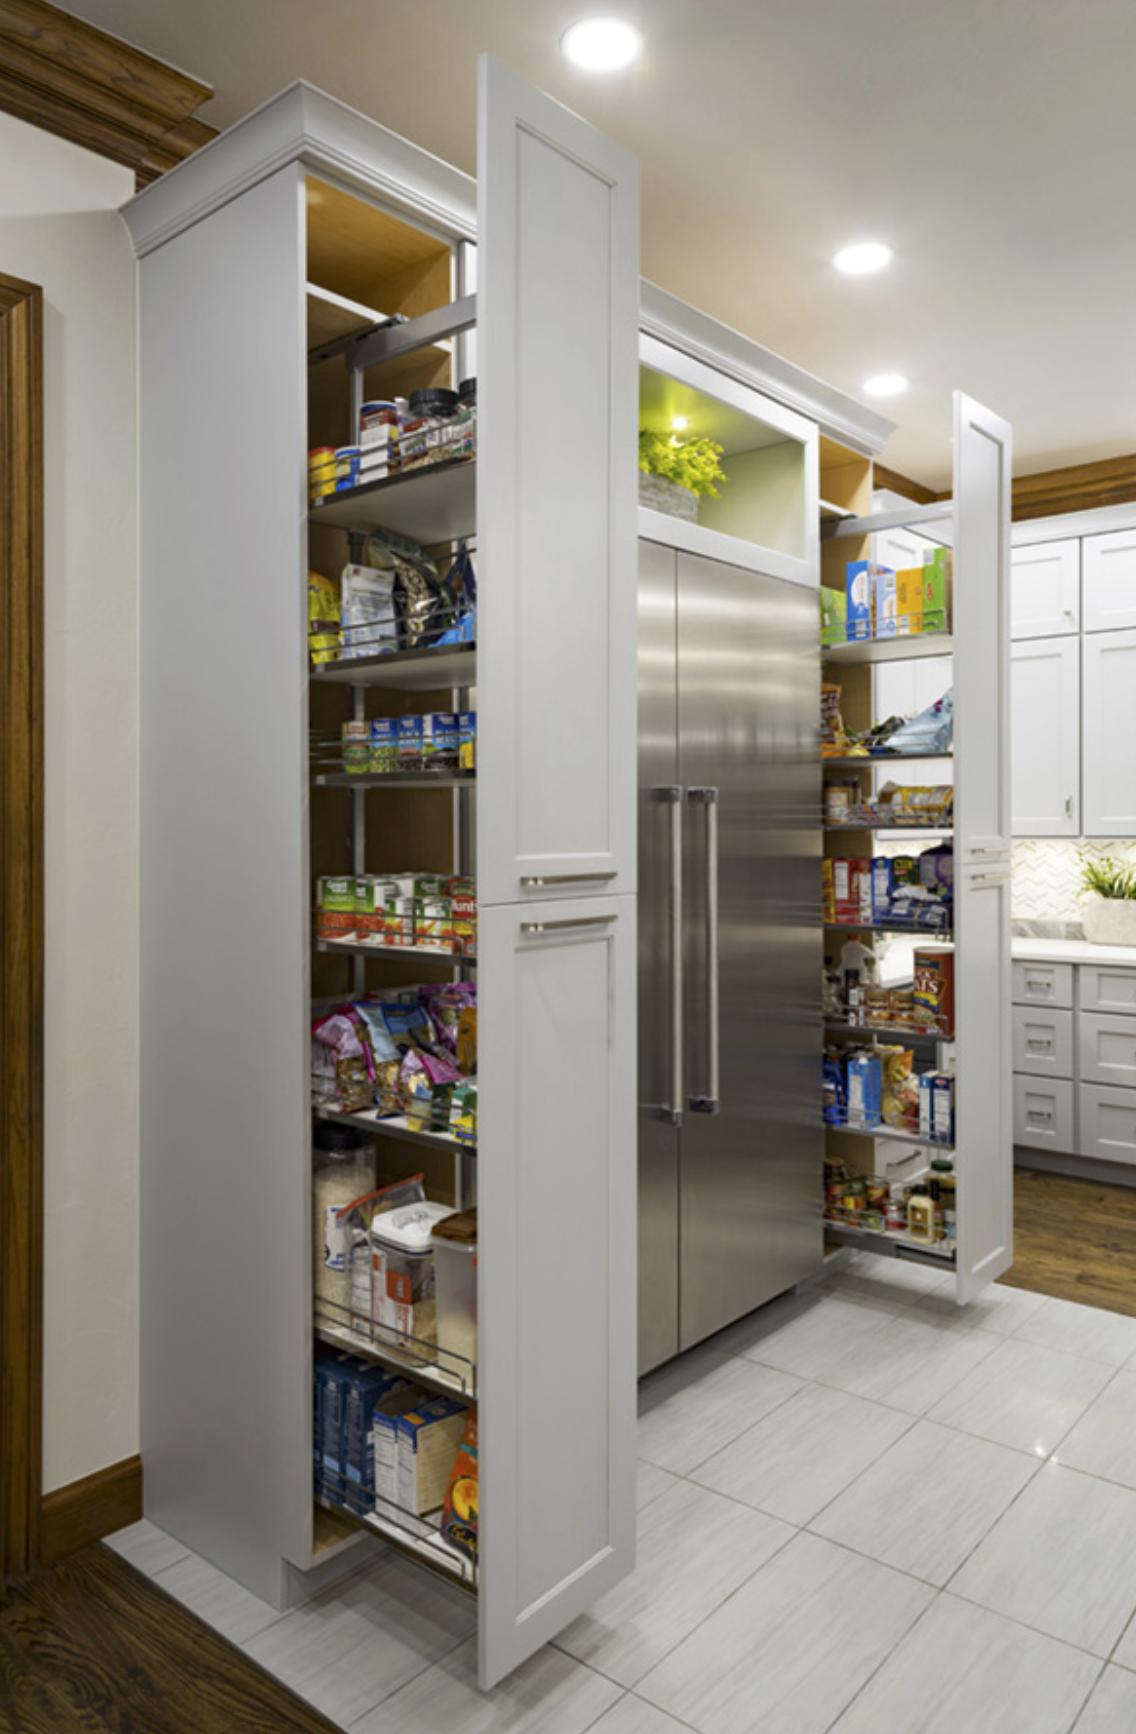 Dispensa Pantry Kessebohmer Clever Storage Dispensa Pantry Kitchen Pantry Design Pantry Design Diy Kitchen Storage